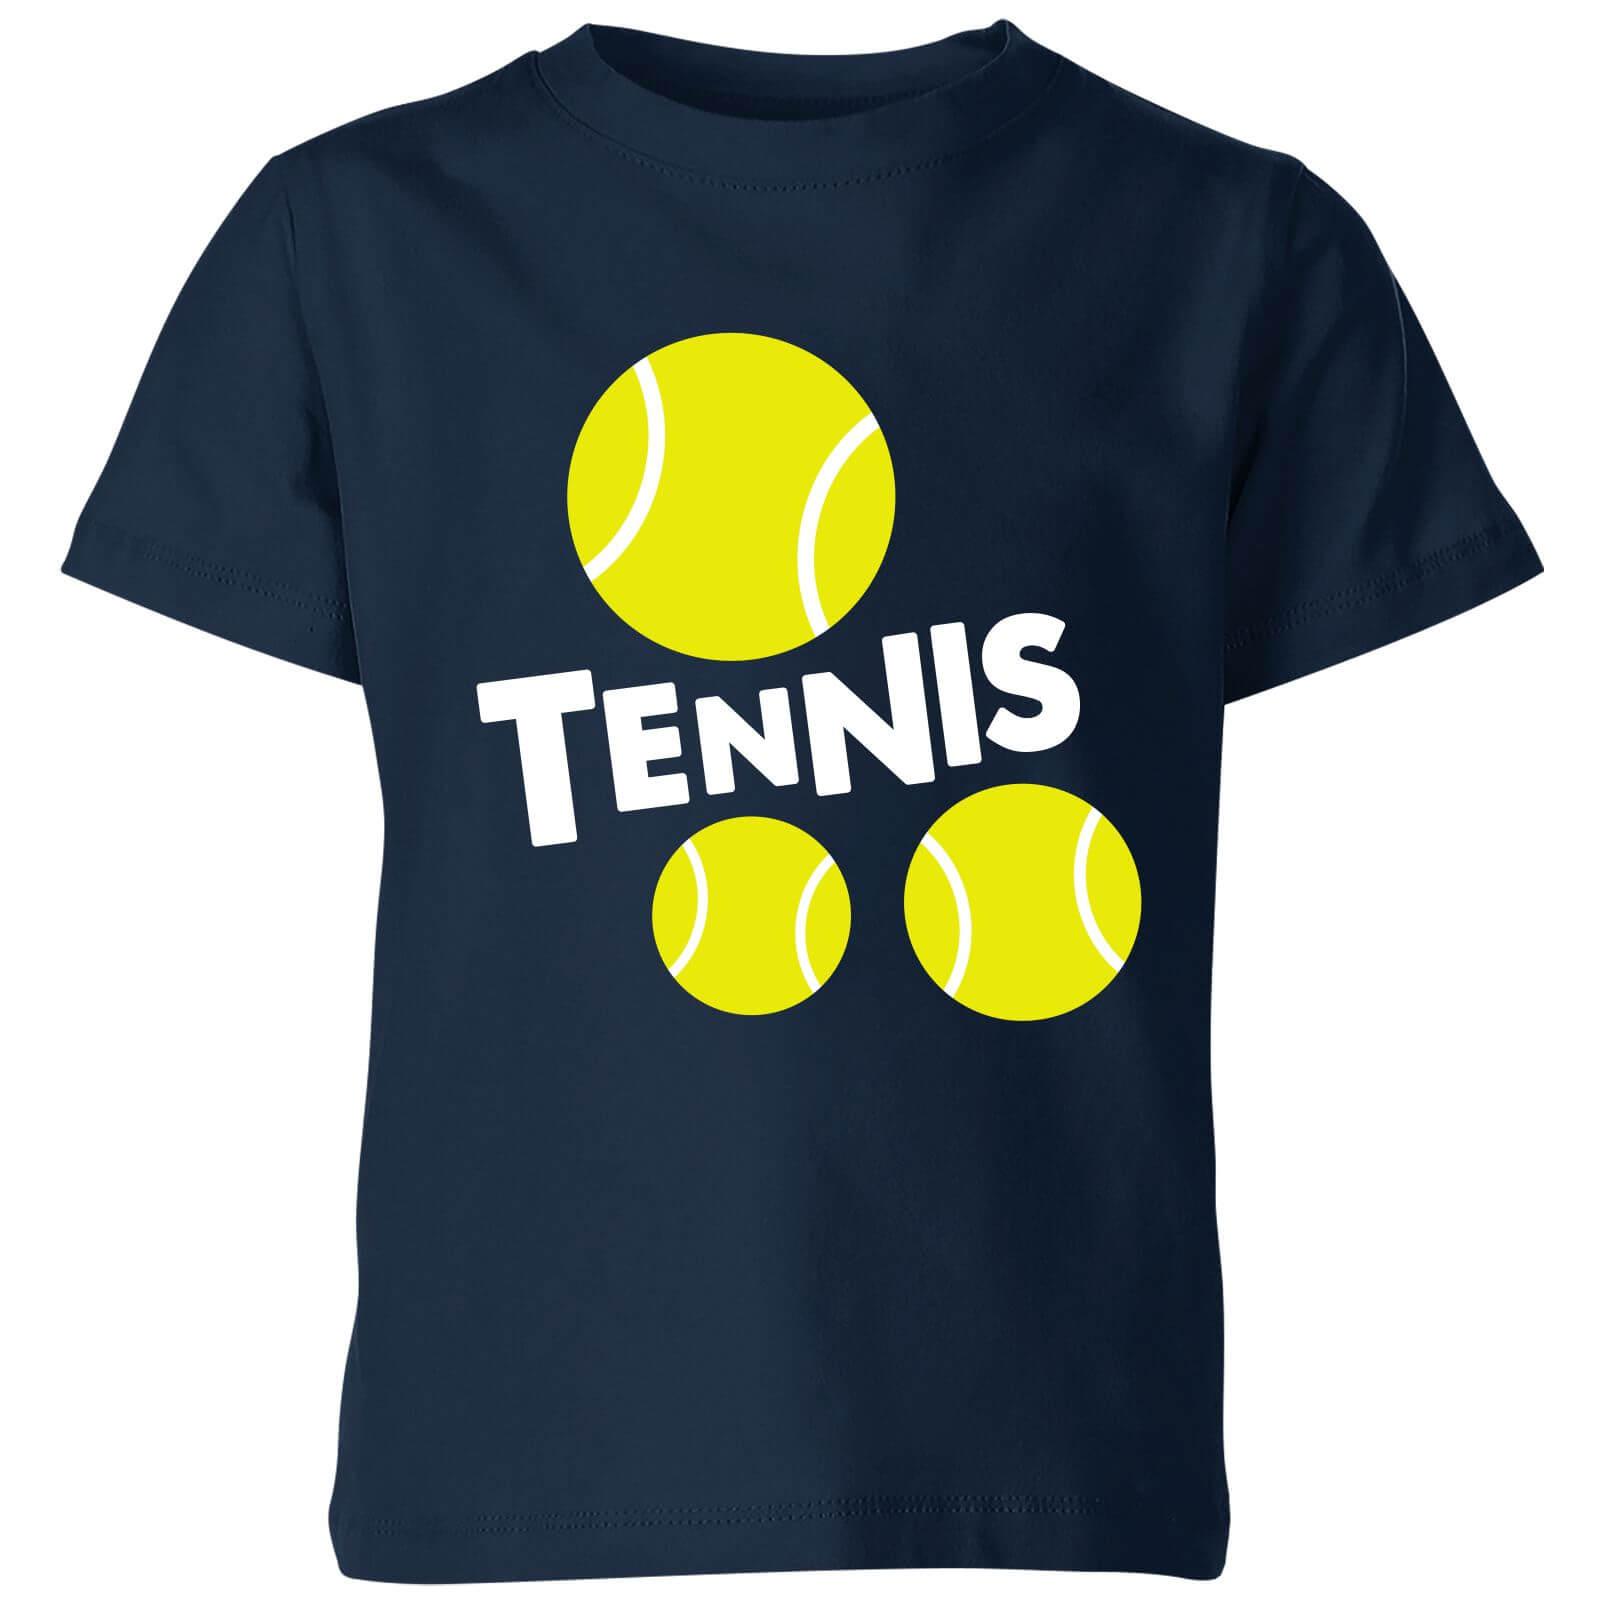 The Tennis Collection Tennis Balls Kids' T-Shirt - Navy - 7-8 Years - Navy-unisex